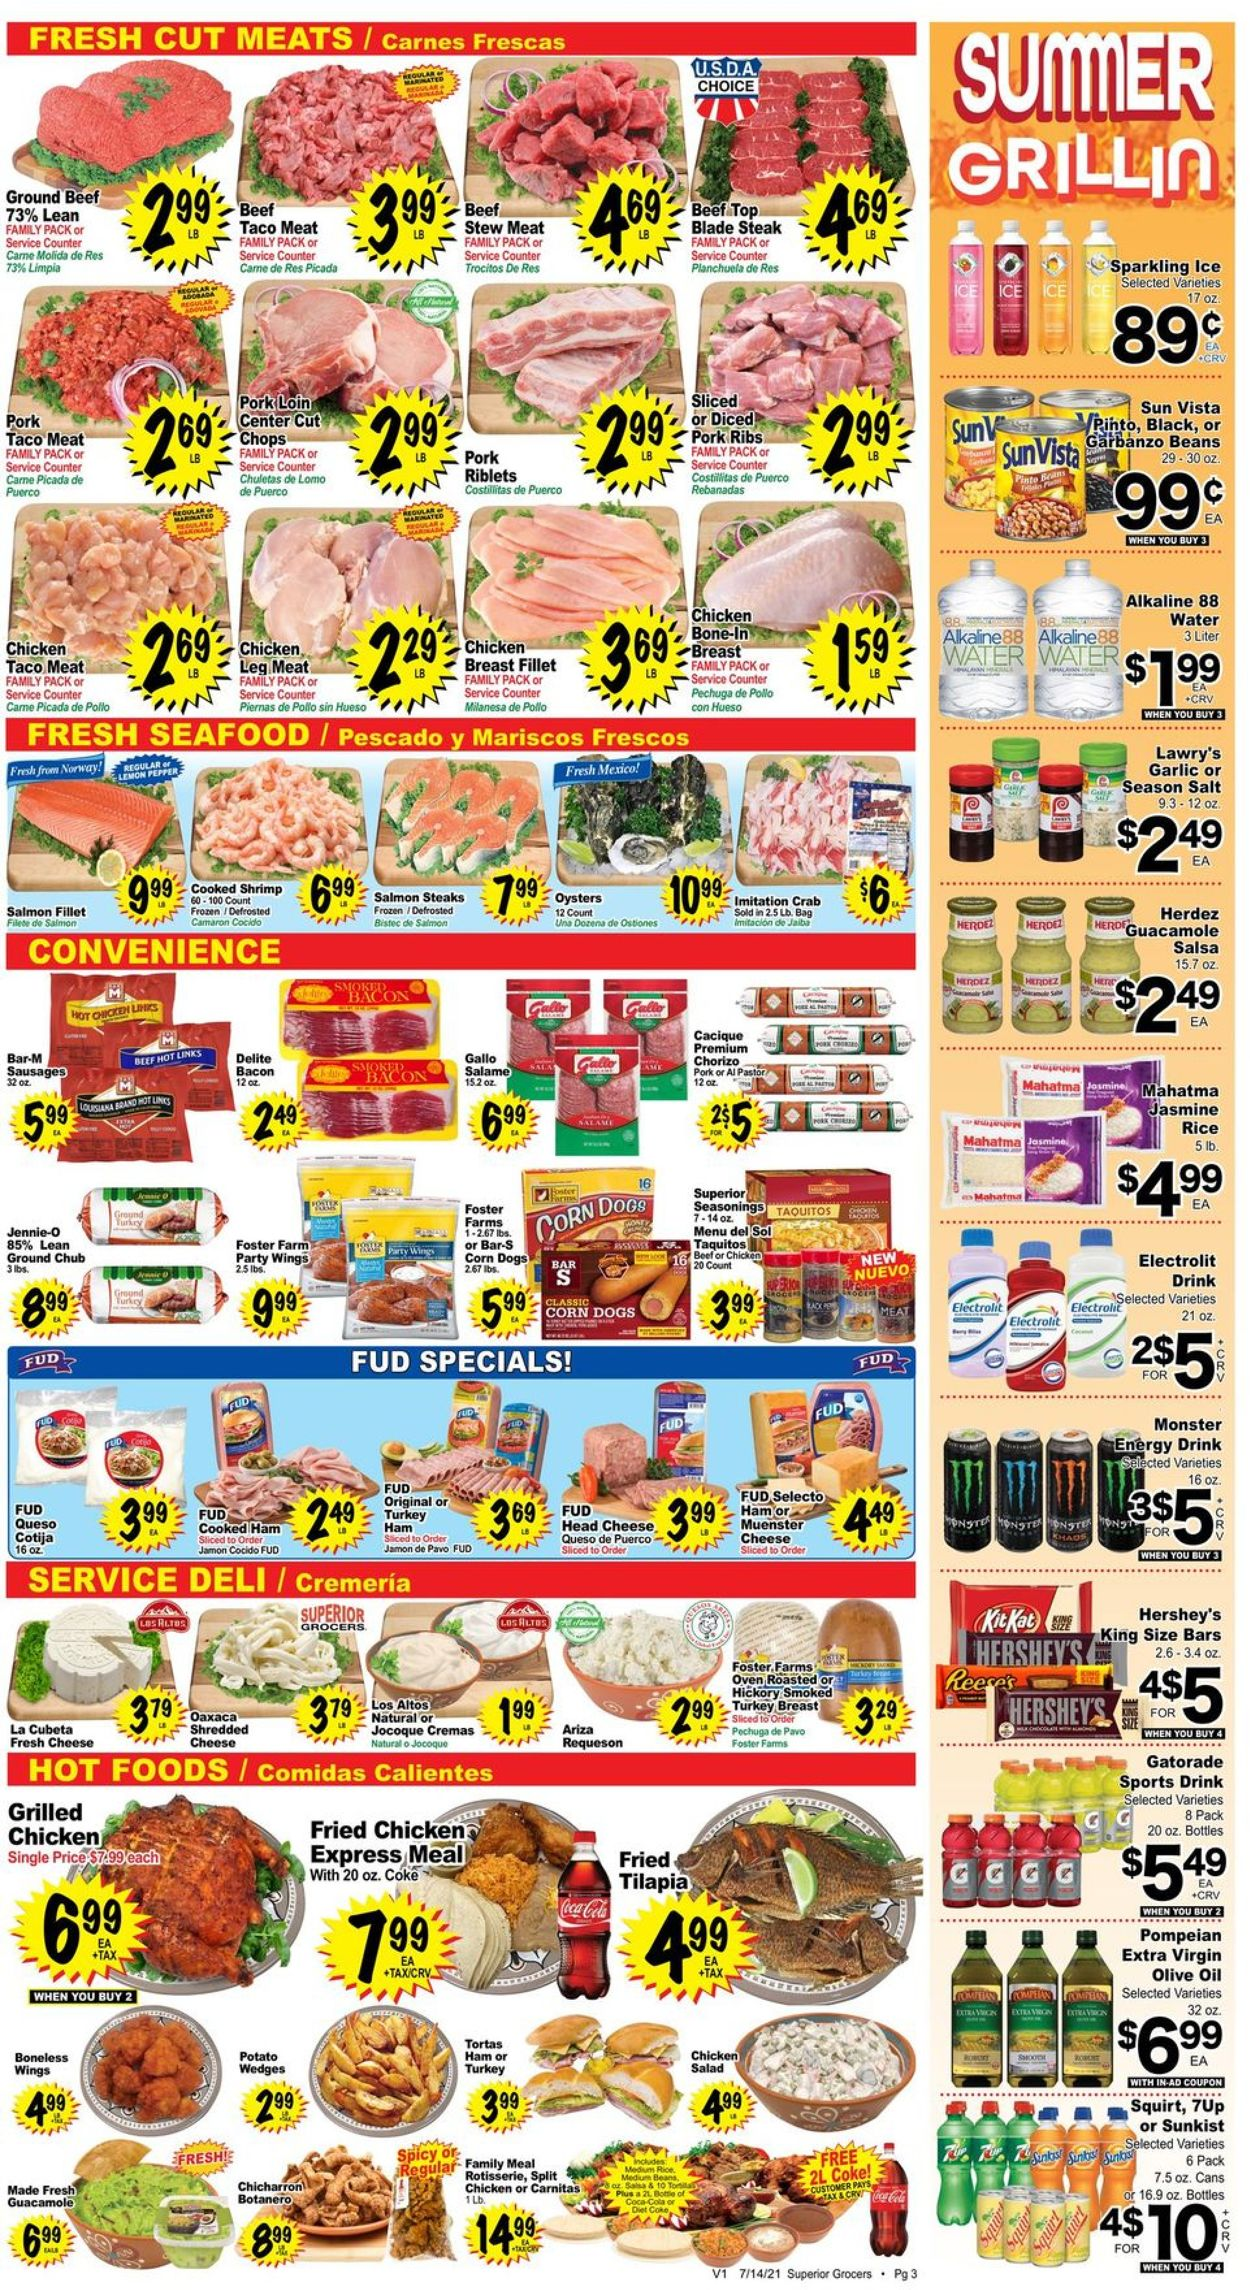 Superior Grocers Weekly Ad Circular - valid 07/14-07/20/2021 (Page 3)